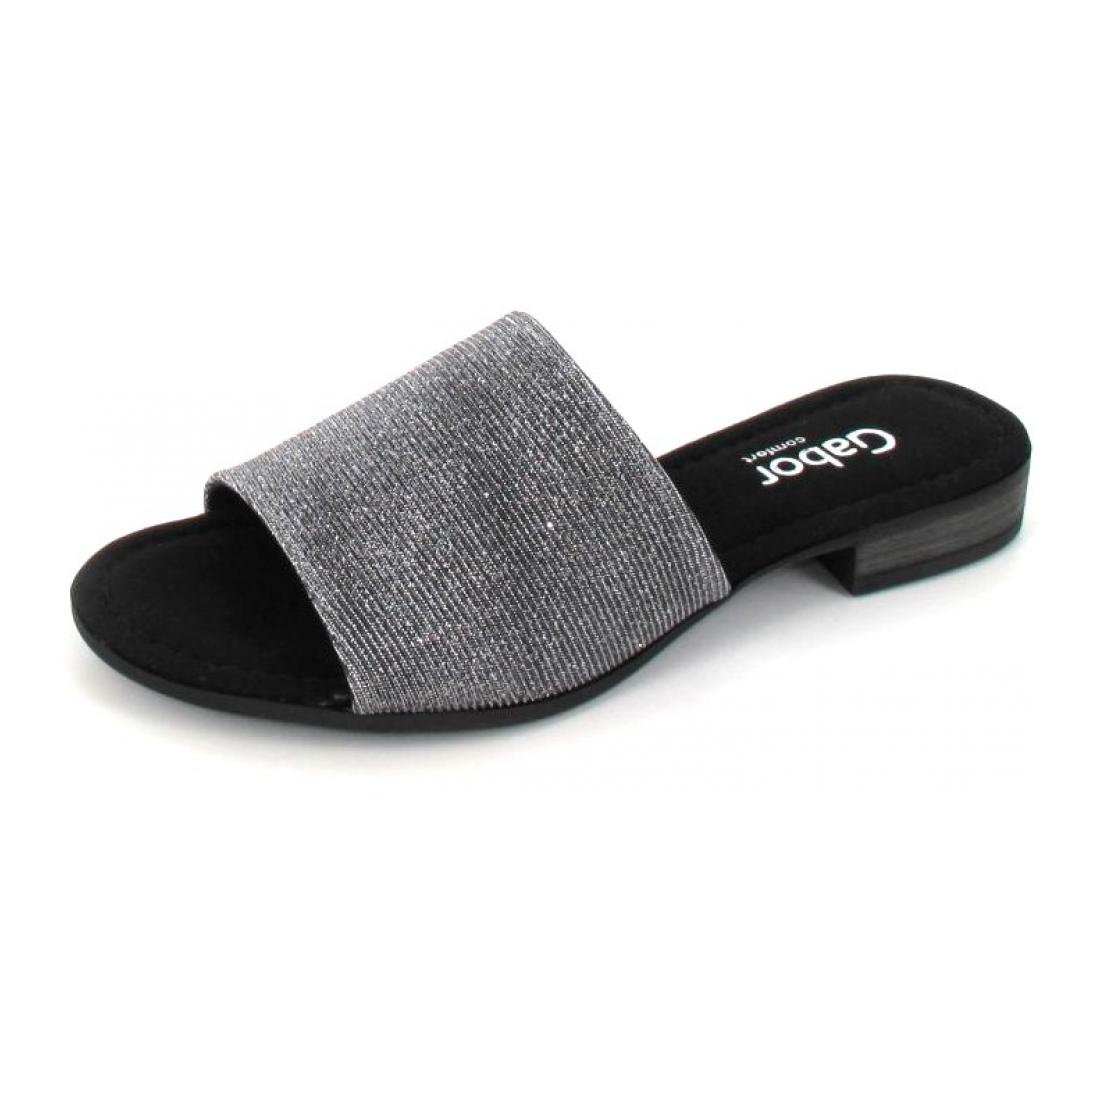 Gabor Comfort Pantolette Rhodos, | Schuh Welt Wo